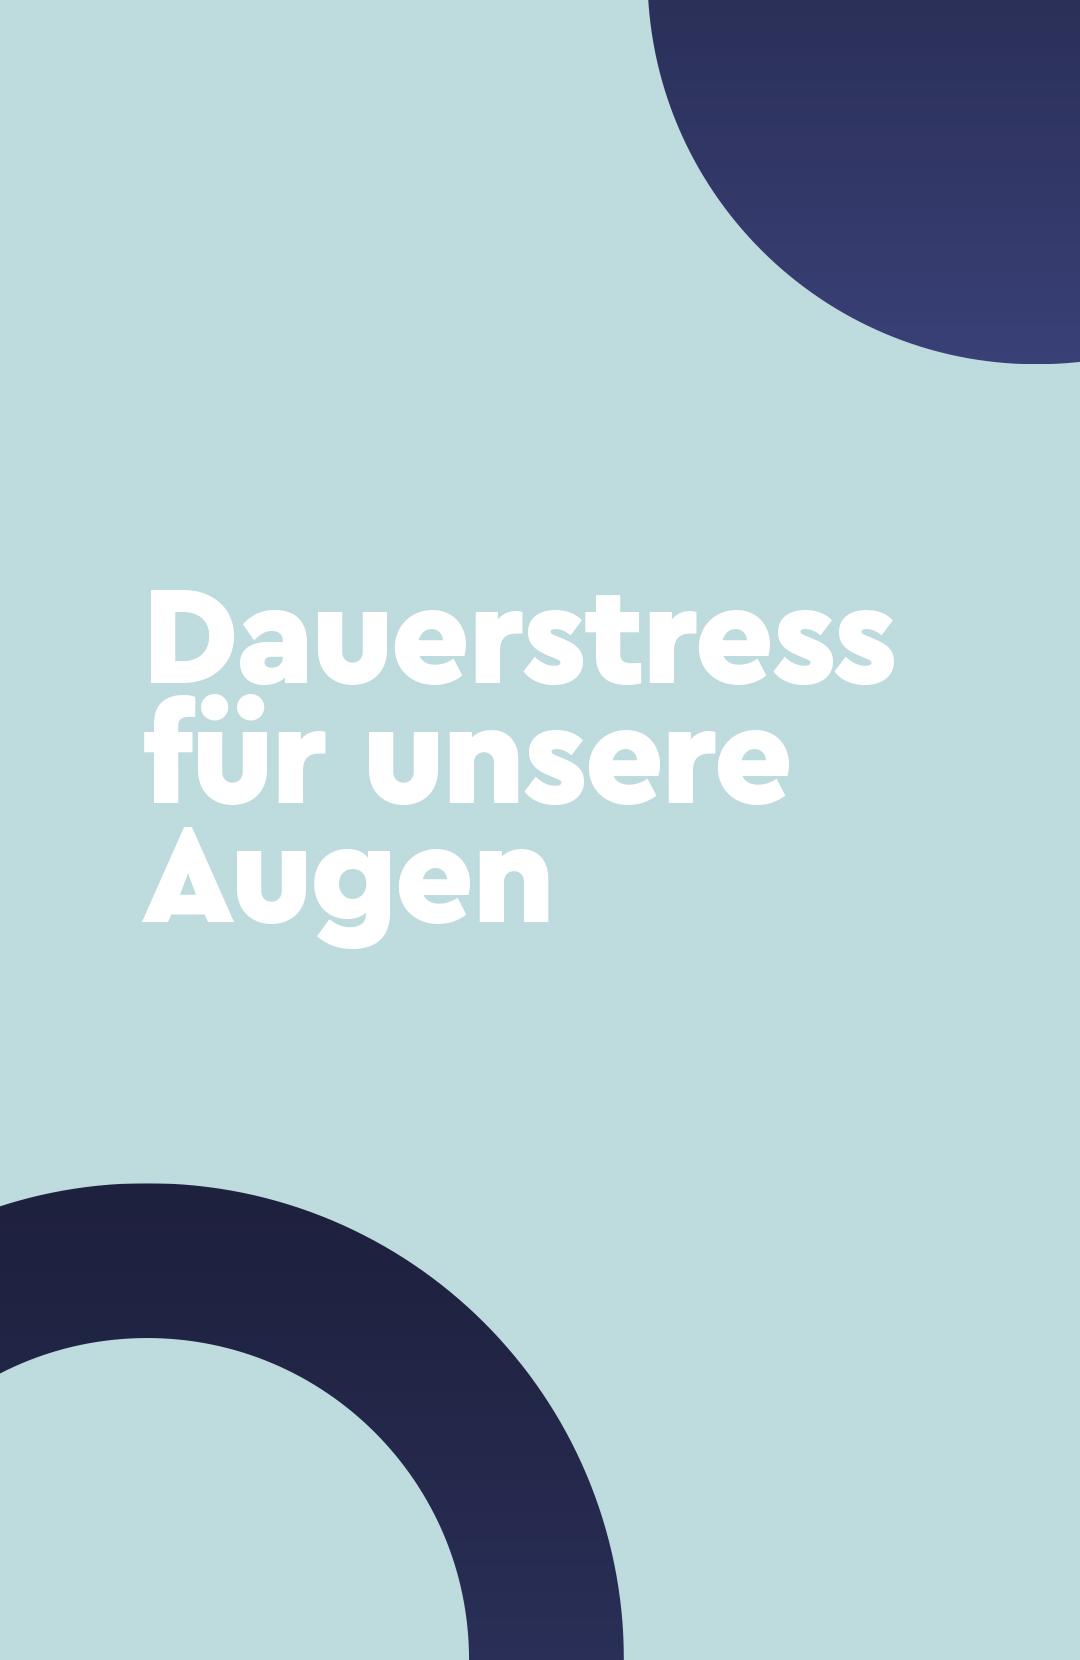 tearstim-djw-bild-hoch-dauerstress